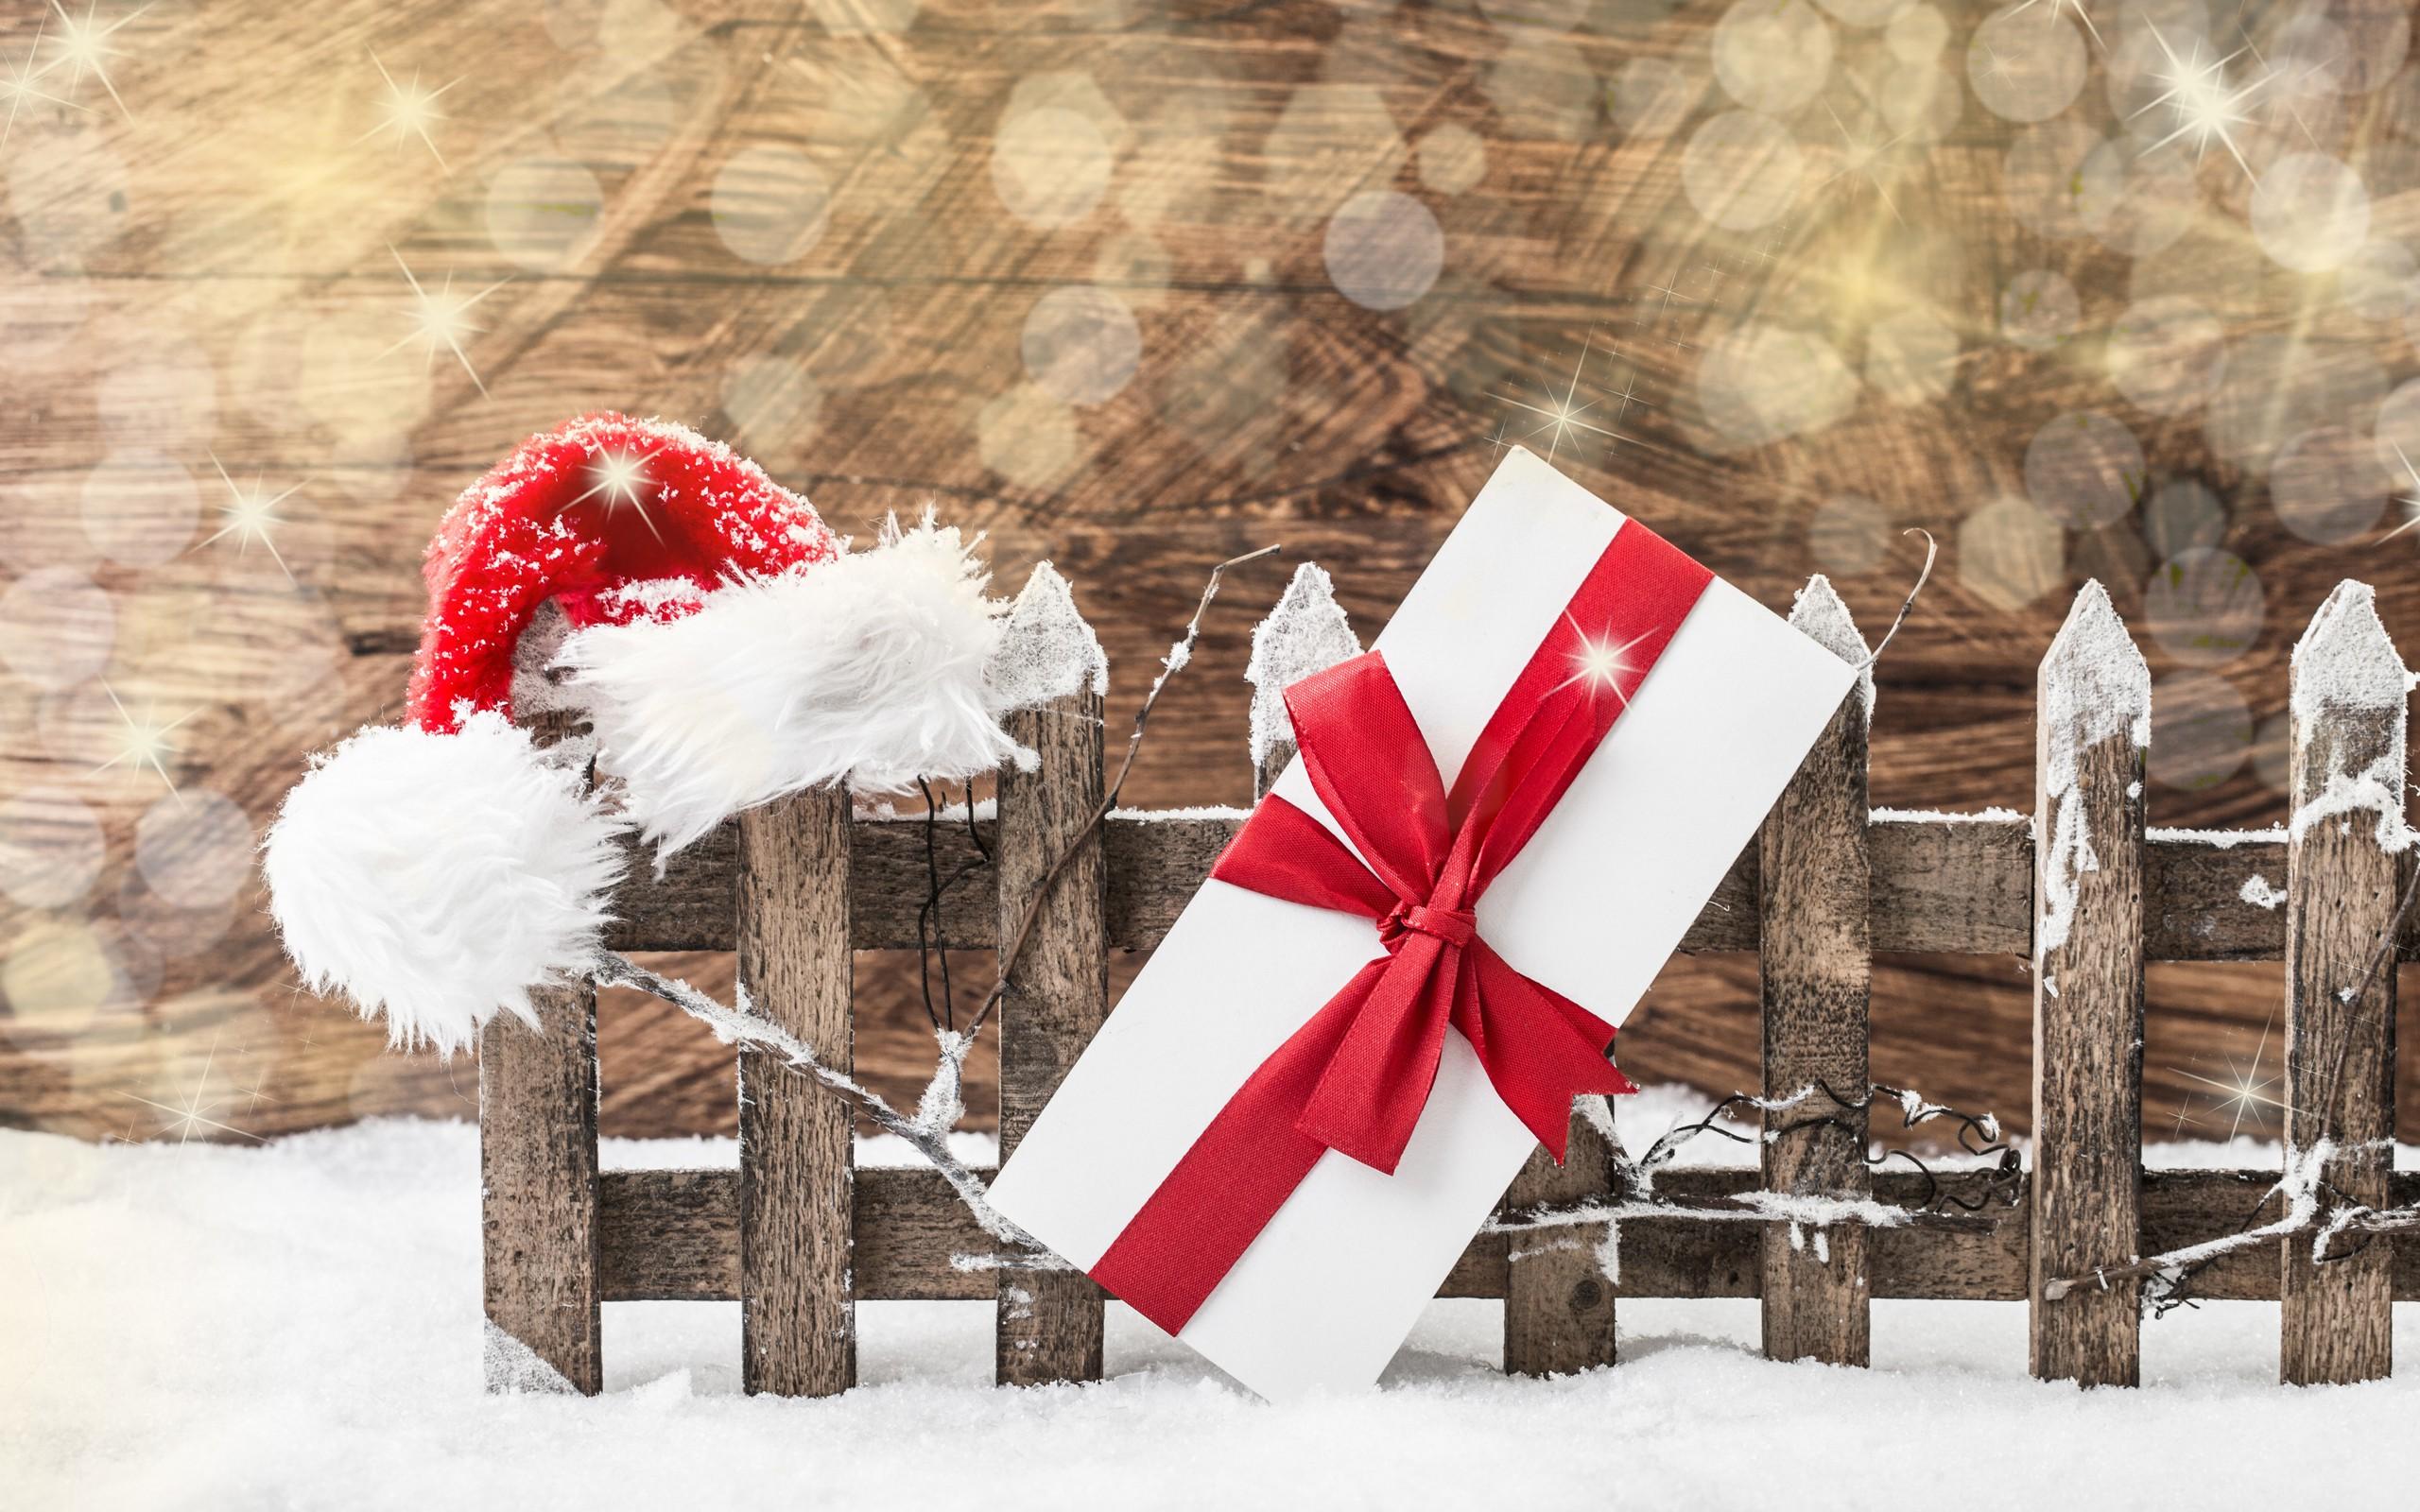 Wallpaper Snow Winter Santa Hats Christmas Presents